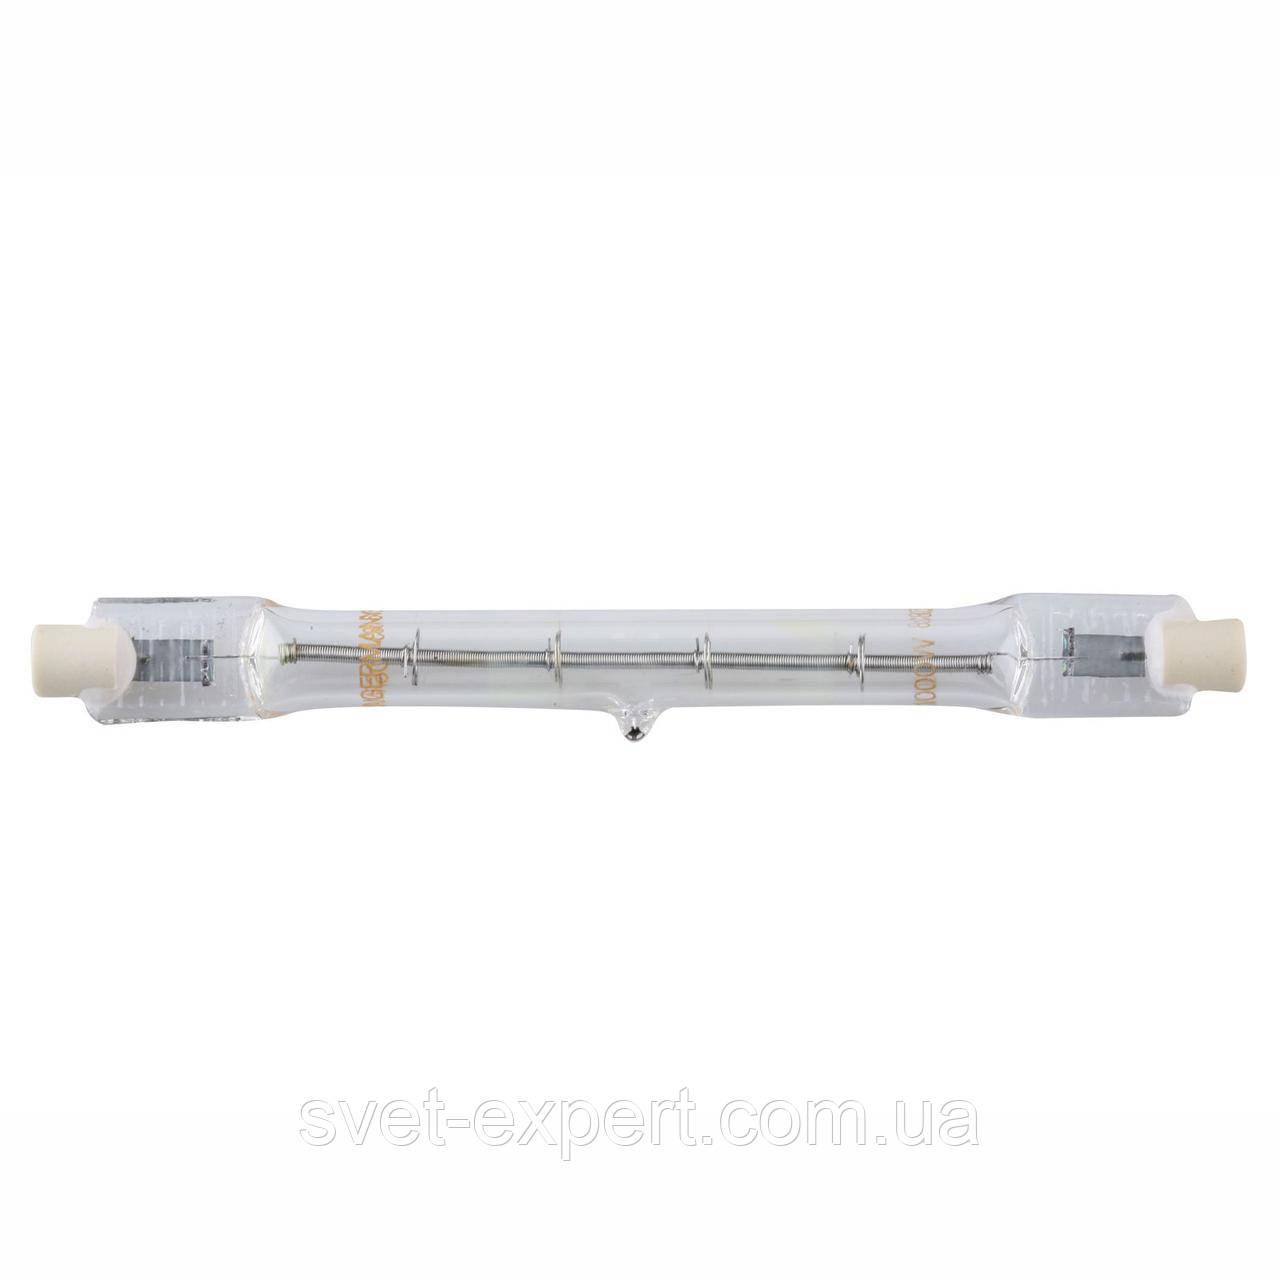 Лампа 64583 1000W 230/240V R7s 12x1 OSRAM